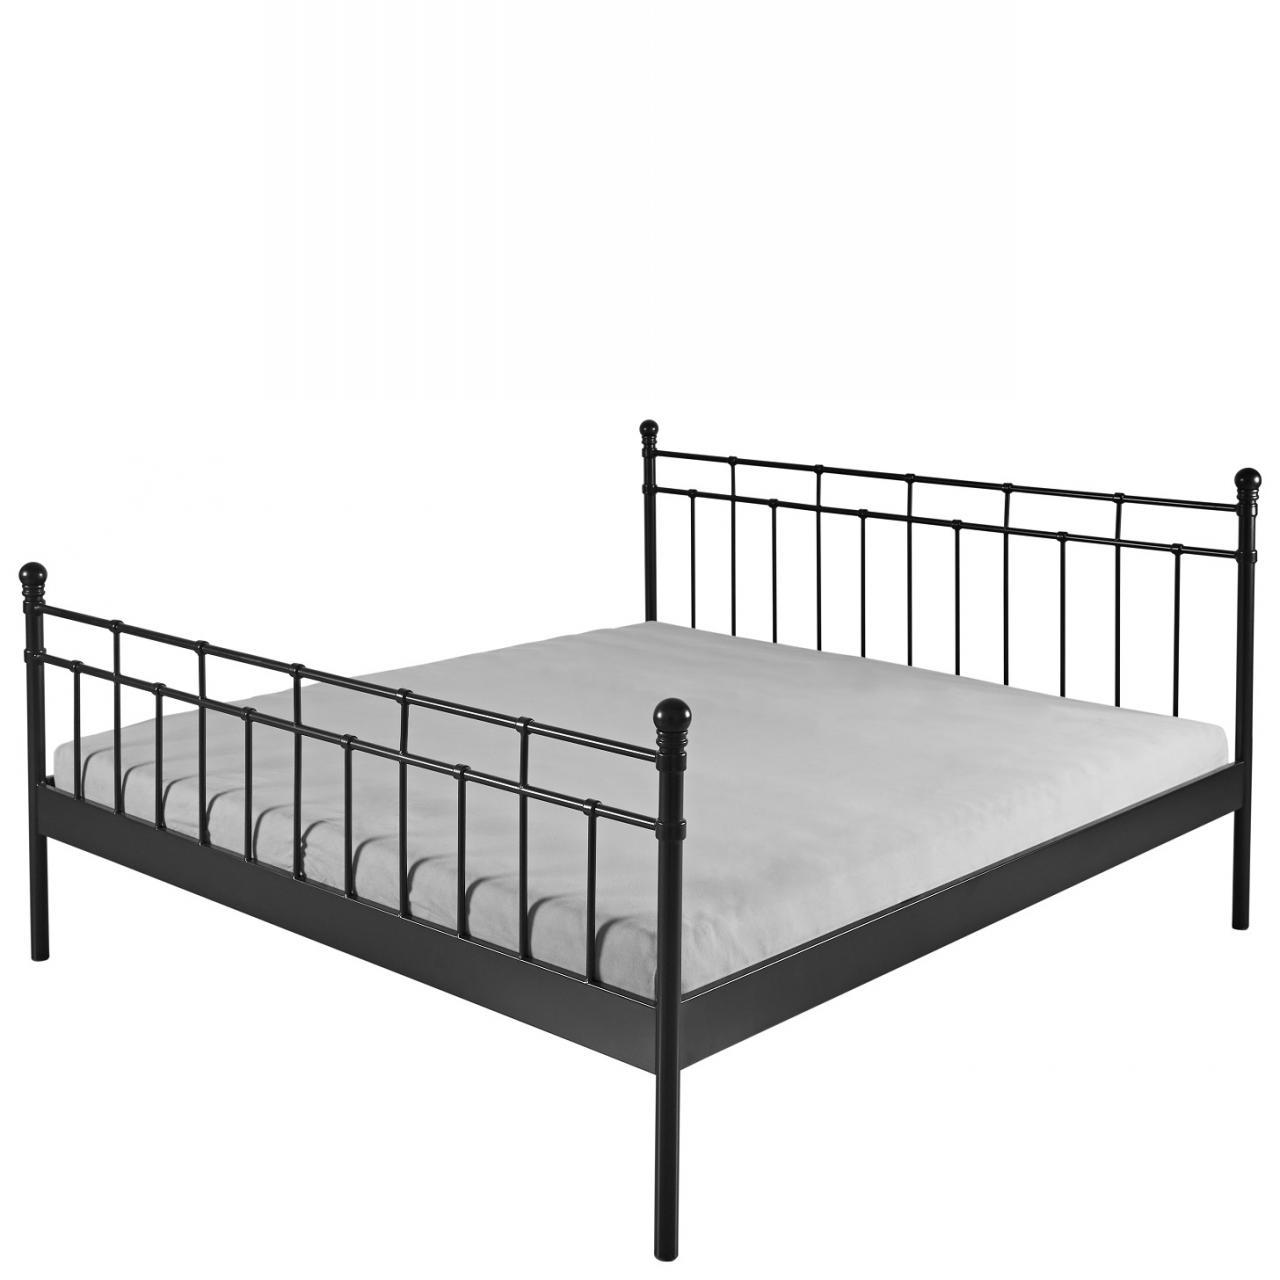 Full Size of Doppelbett Verena Metall Schwarz 140x200 Gstebett Schlafzimmer Rauch Betten Bett Mit Lattenrost Stauraum 160x200 Feng Shui Niedrig 180x200 Günstig Bett 140x200 Bett